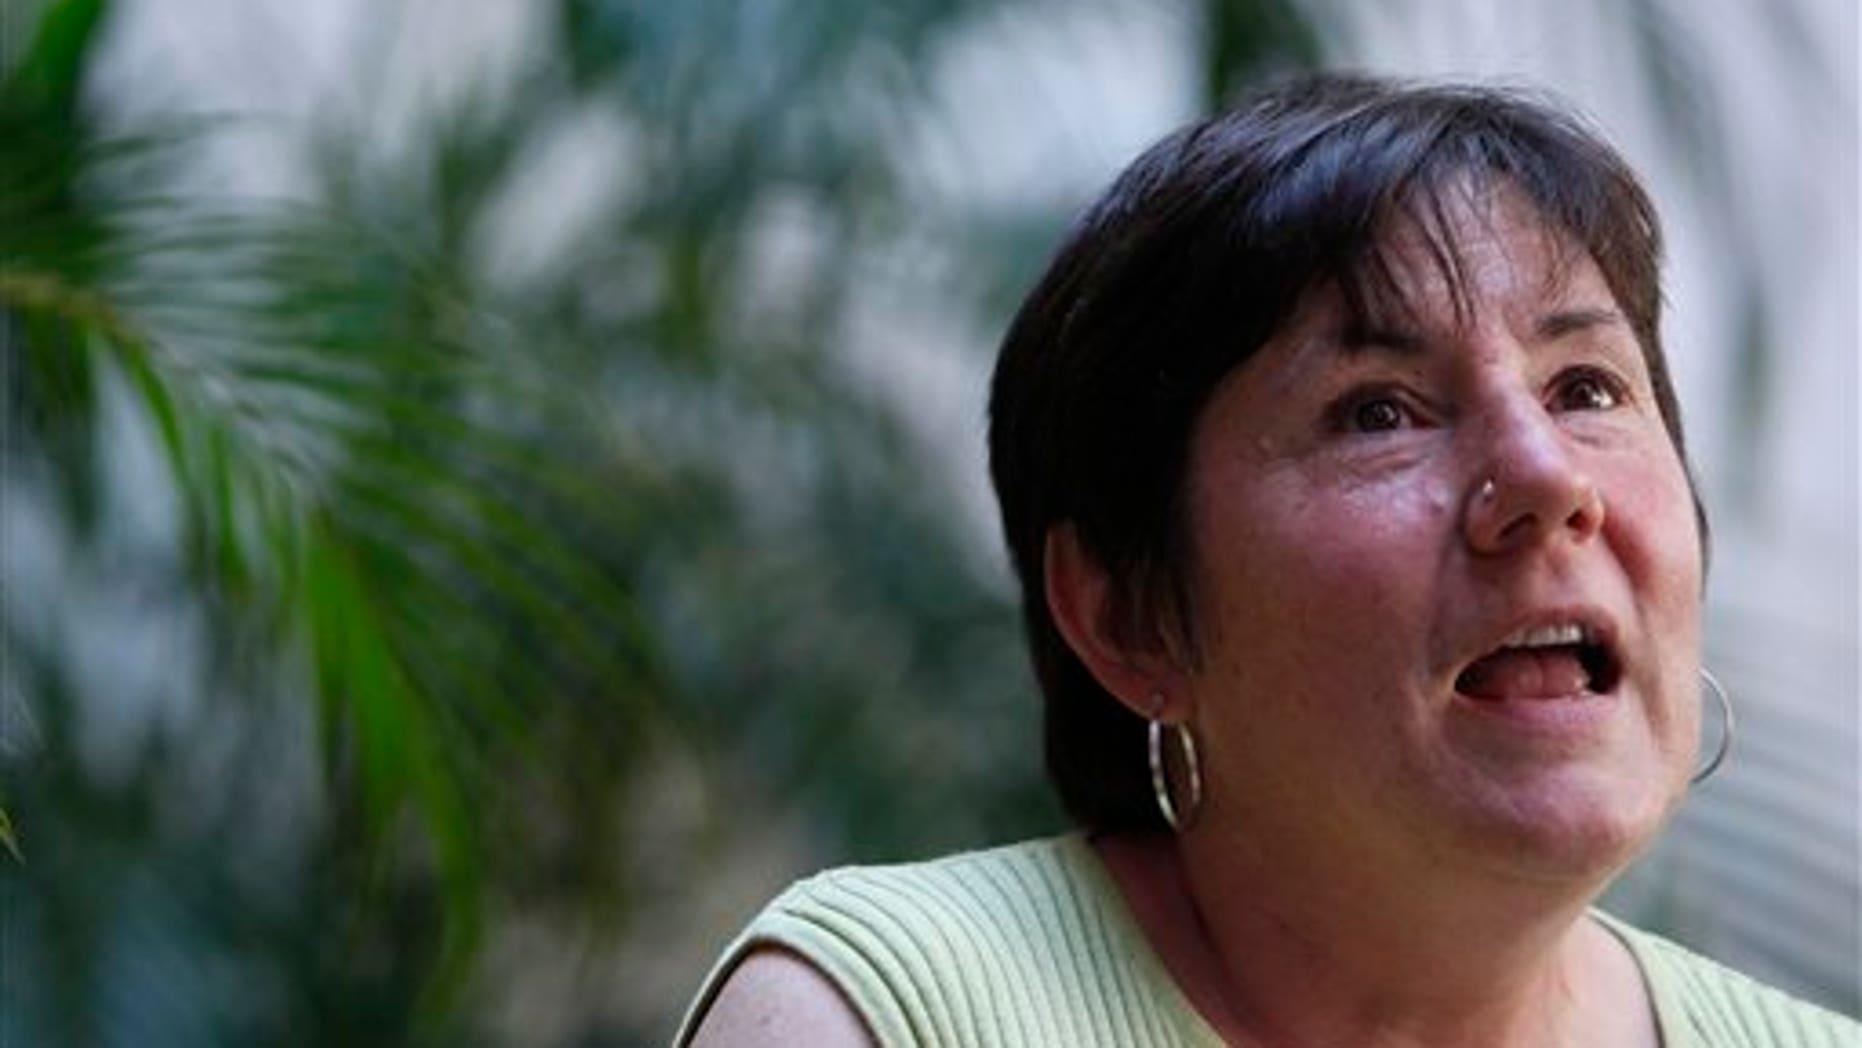 Elizabeth Martin, of Massachusetts, speaks about her late nephew Joseph Martin in Rio de Janeiro, Brazil.